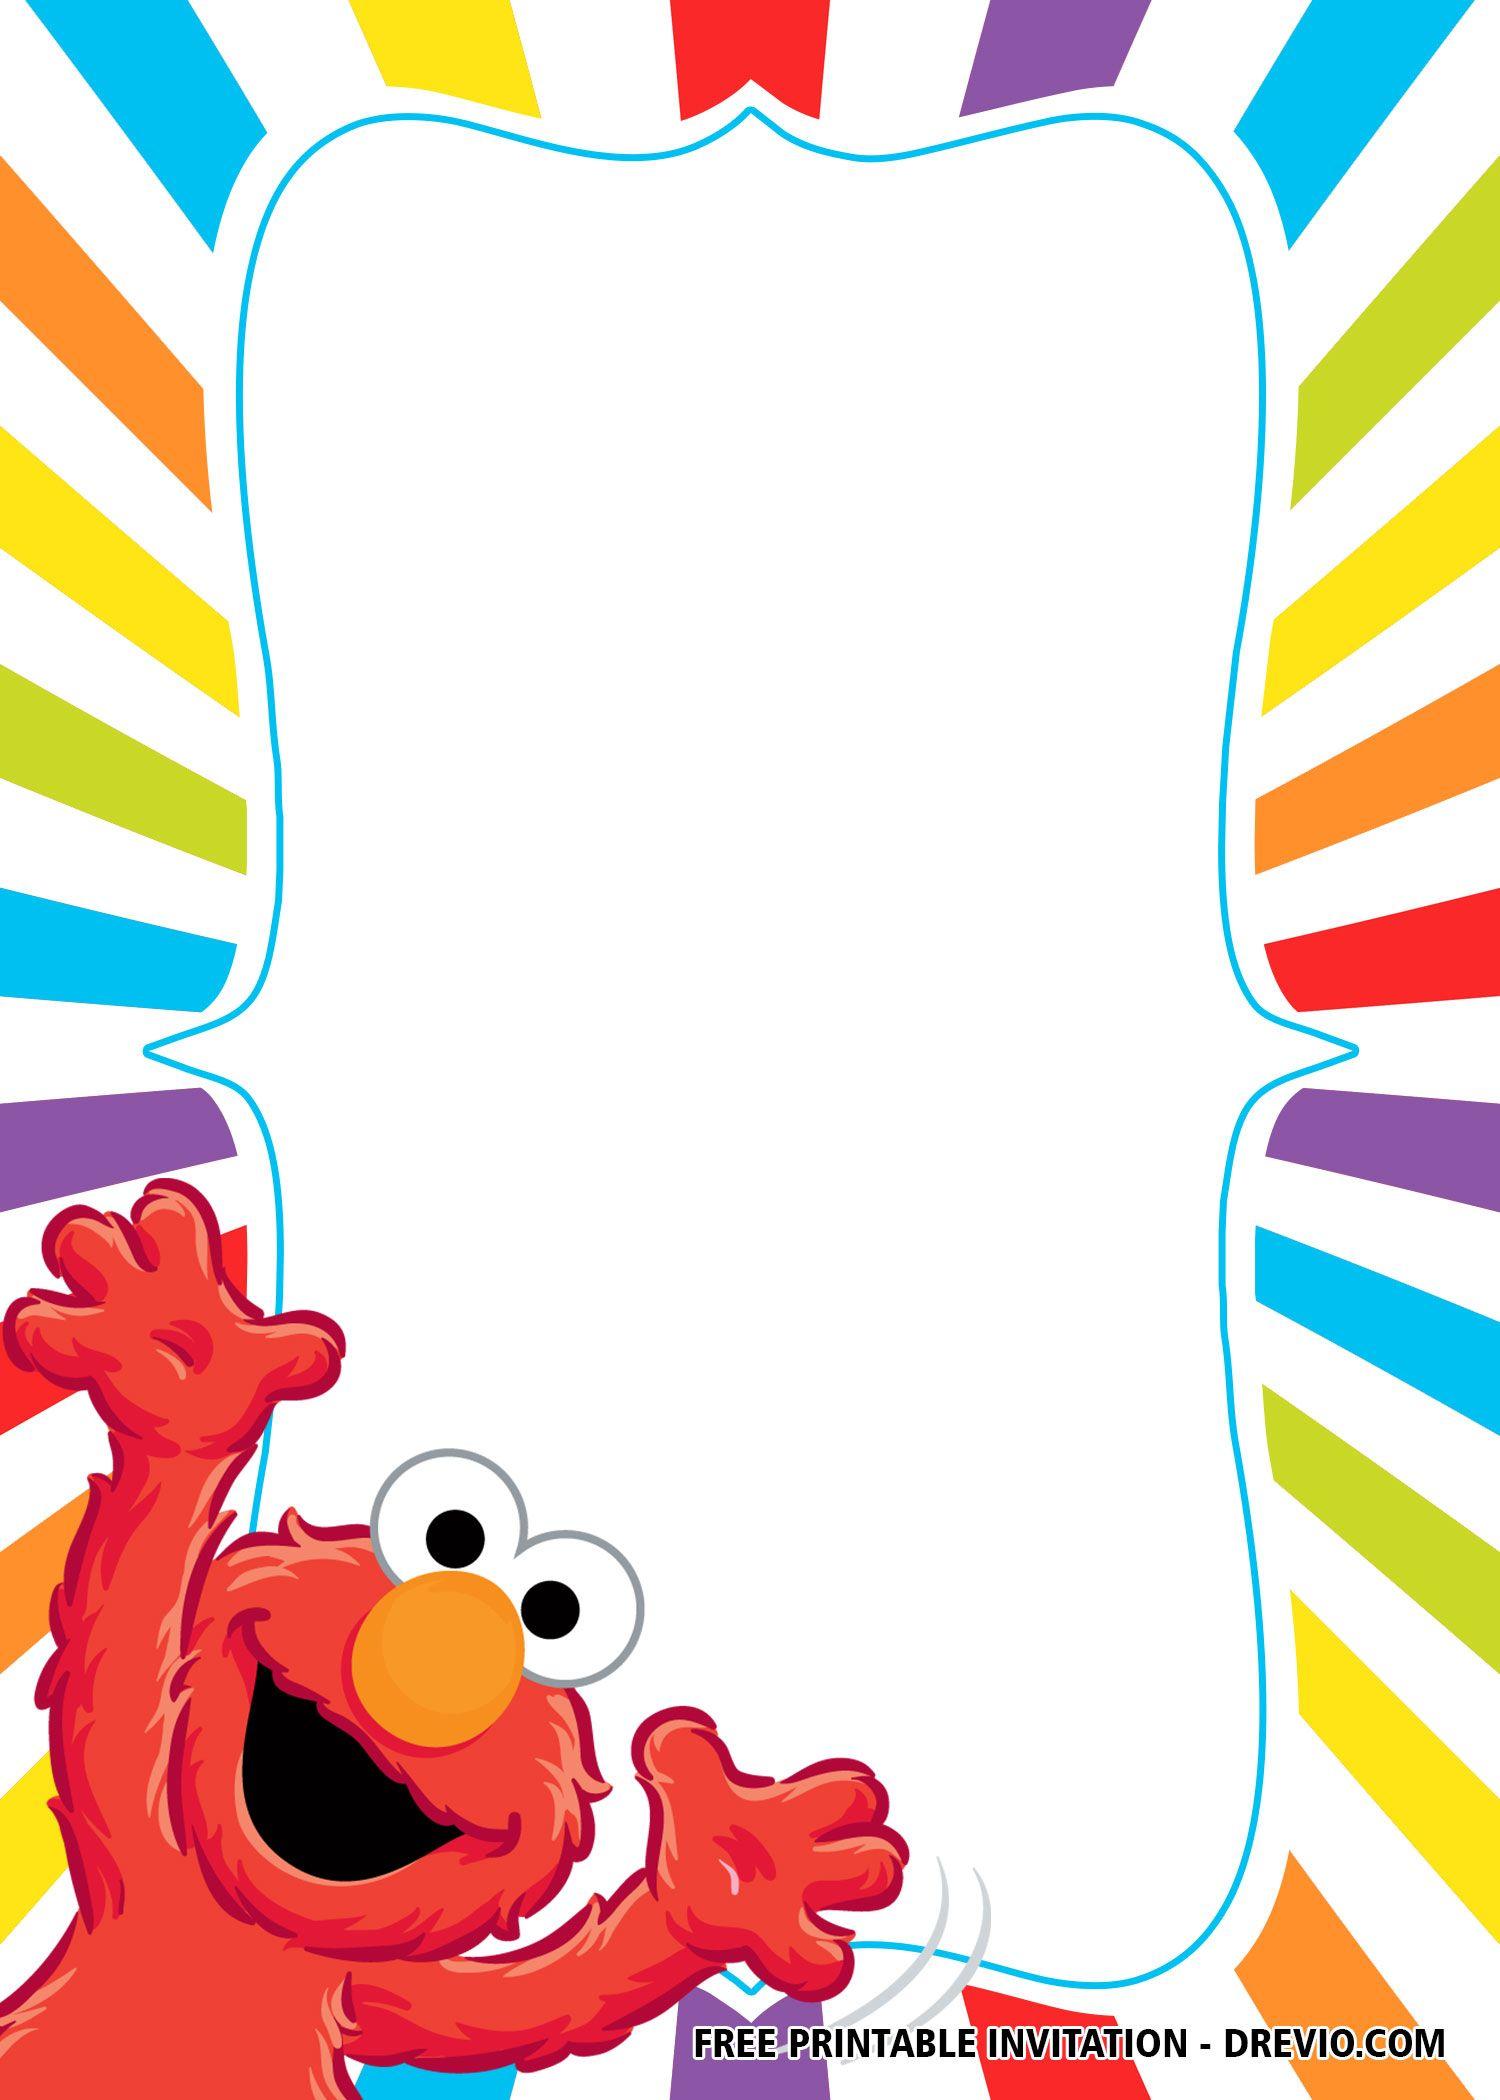 Free Elmo Birthday Invitation Templates Elmo Birthday Invitations Sesame Street Invitations Elmo Invitations